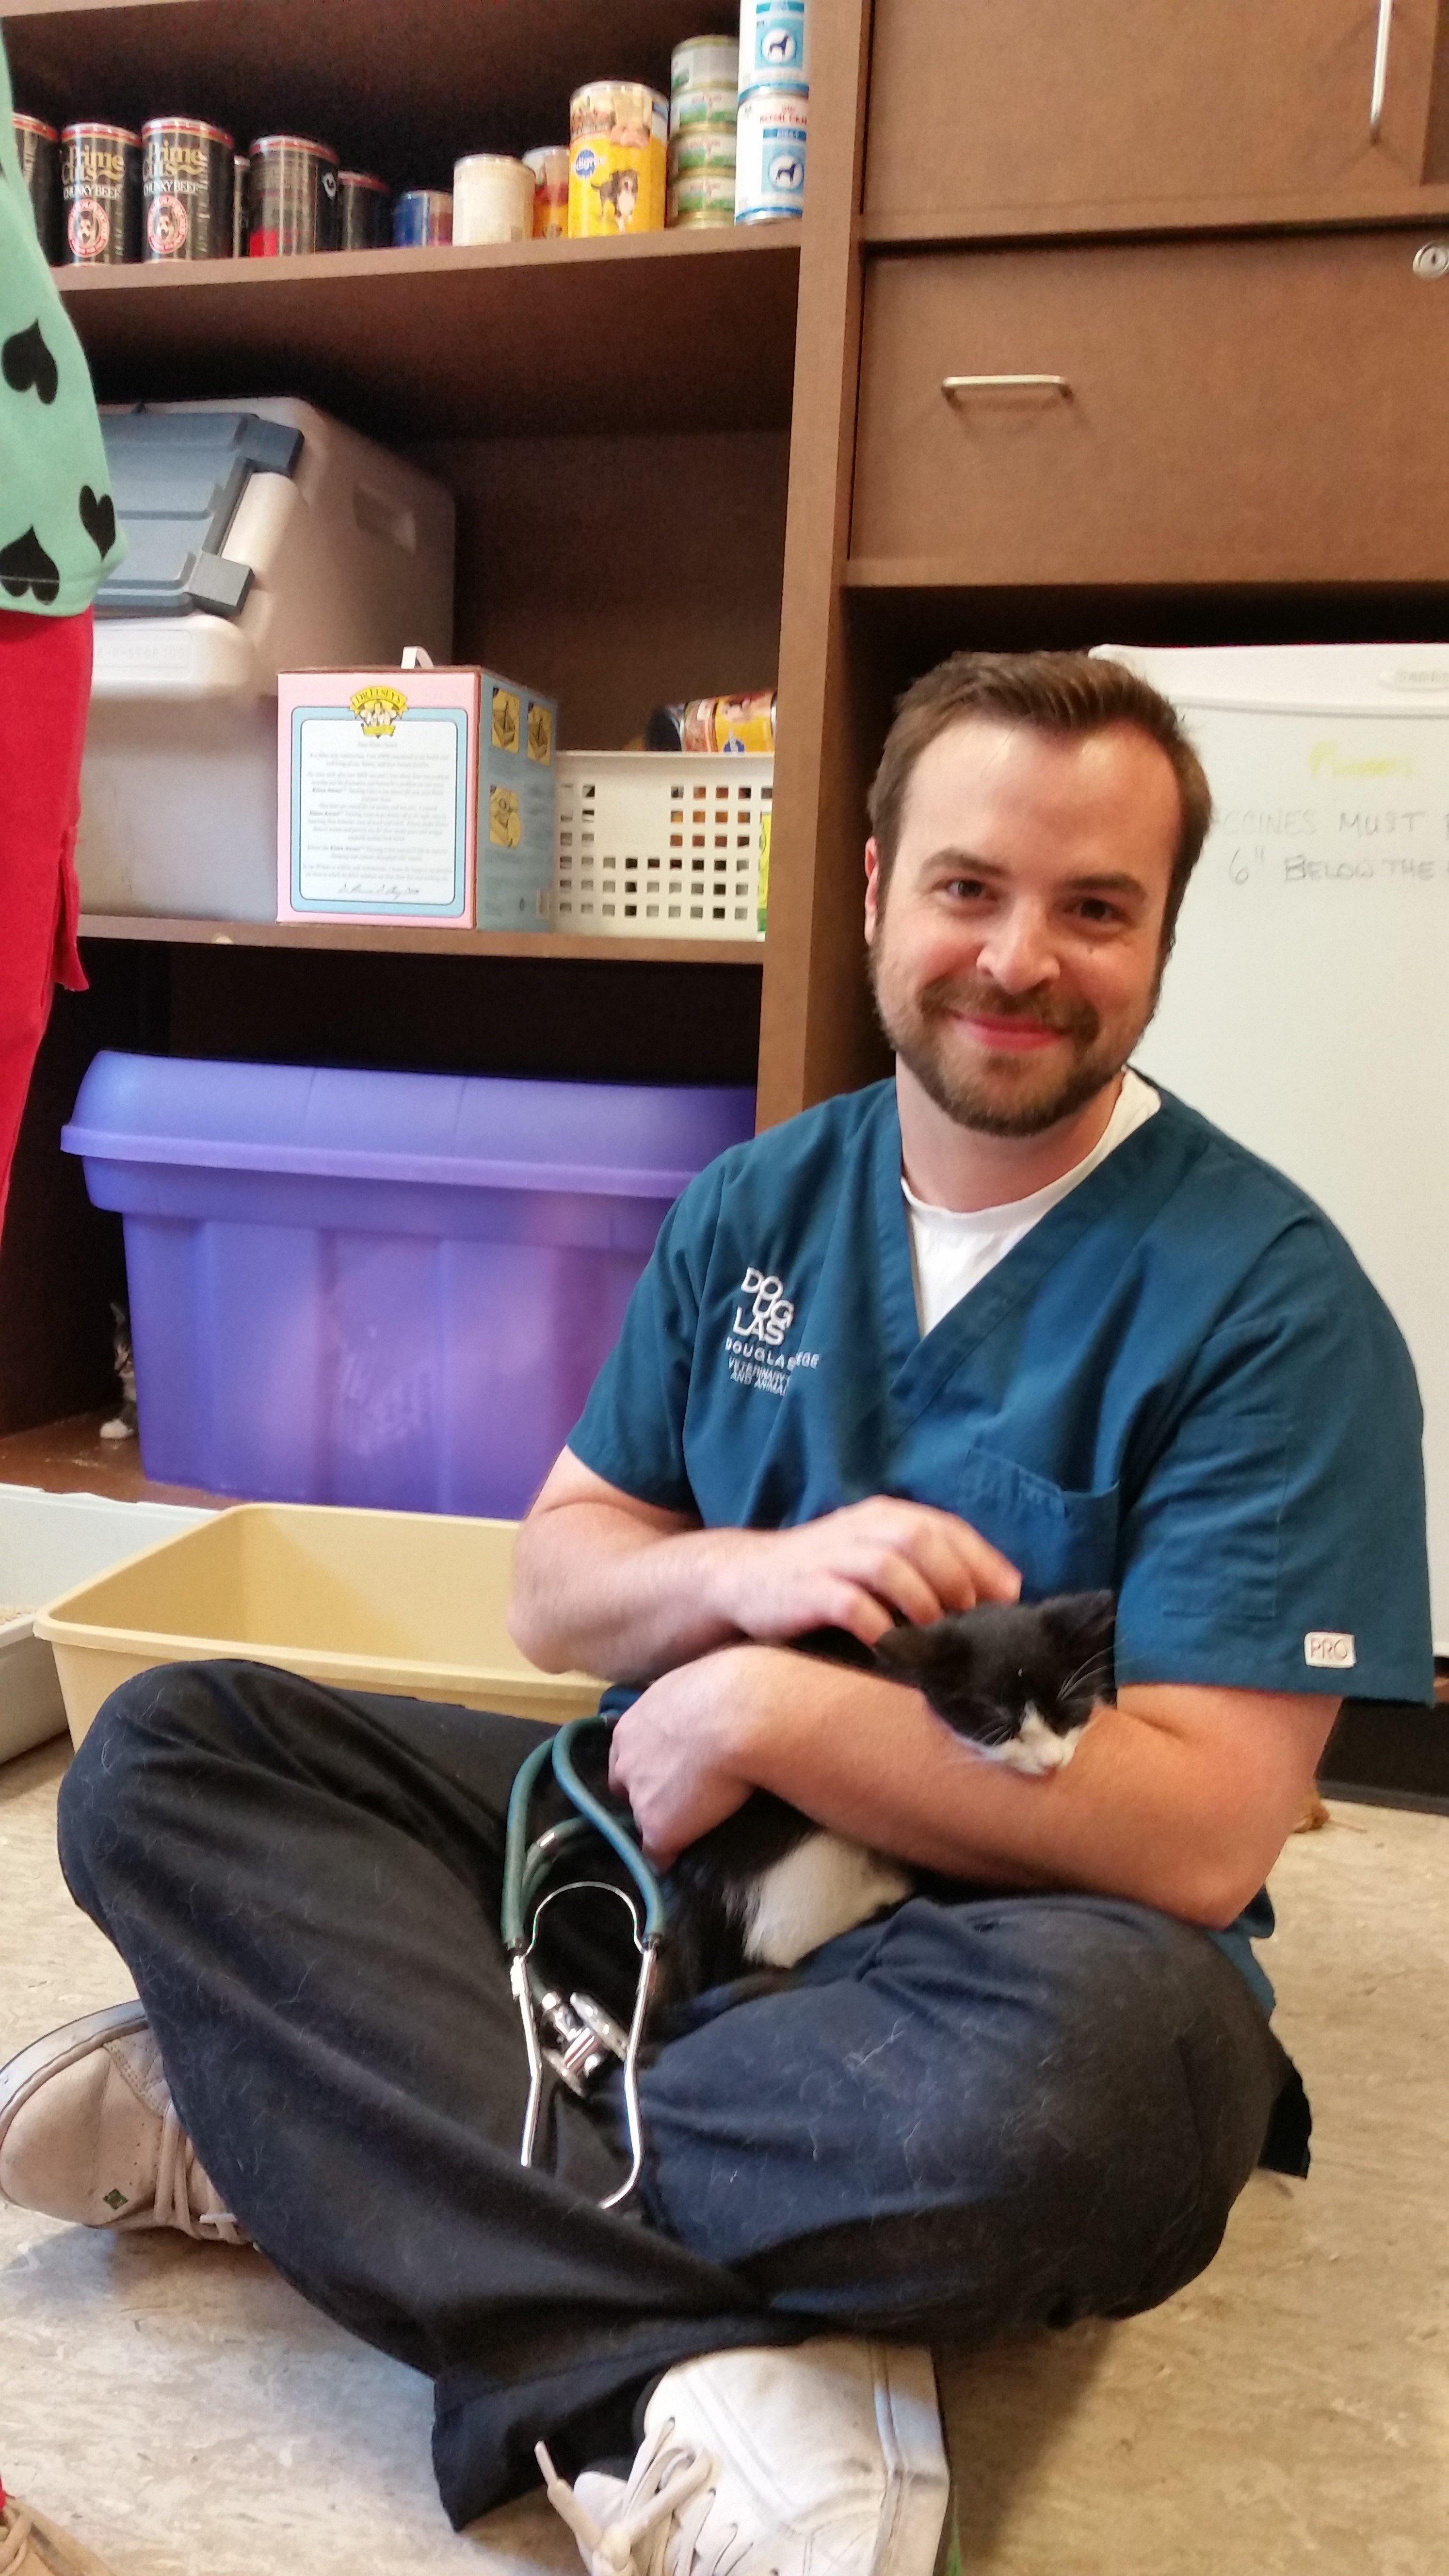 Jan Werger of Shaughnessy Veterinary Hospital